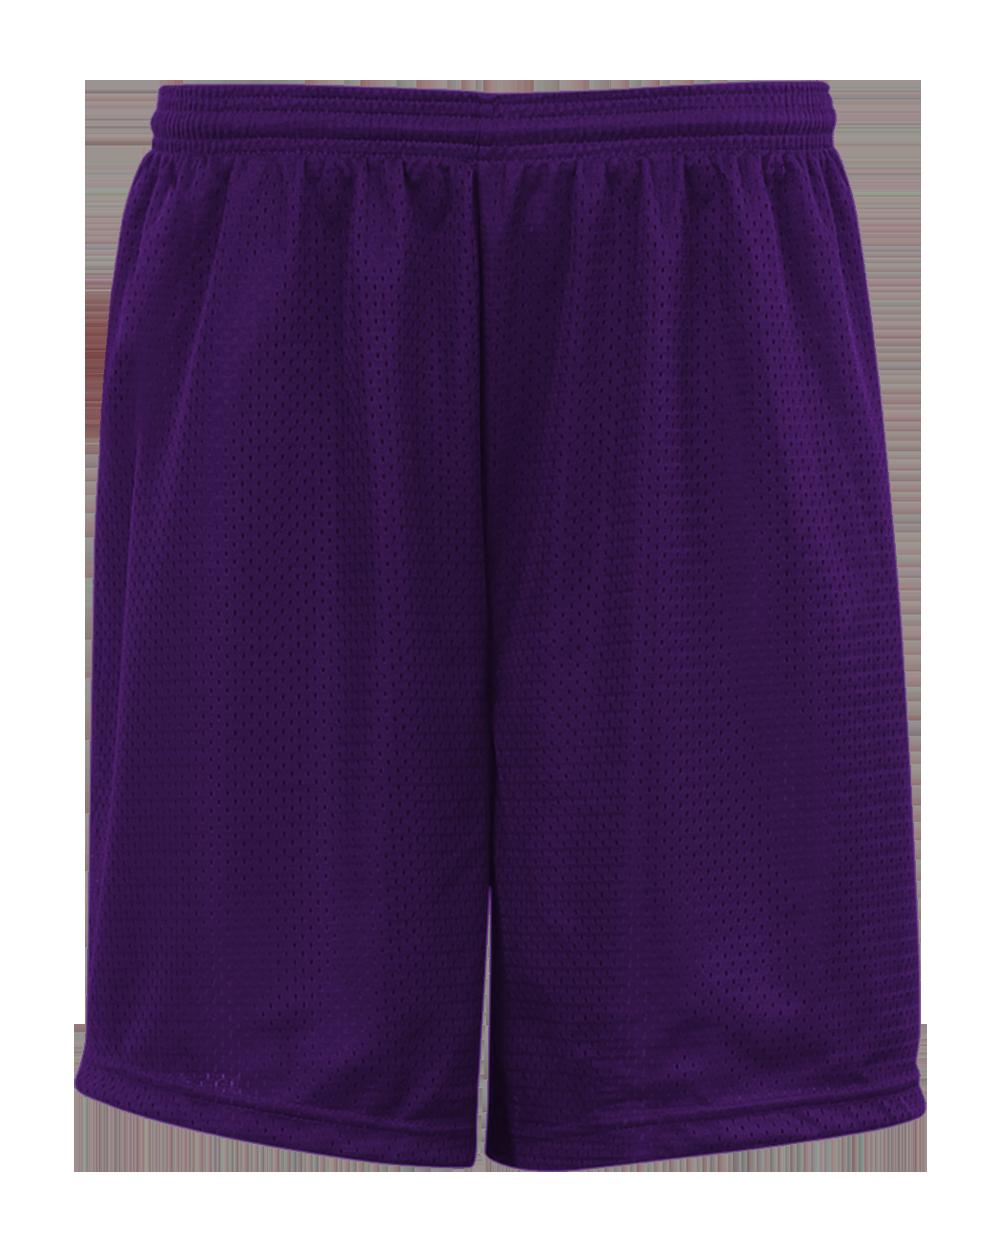 C2 Mesh 7 Inch Short - Purple